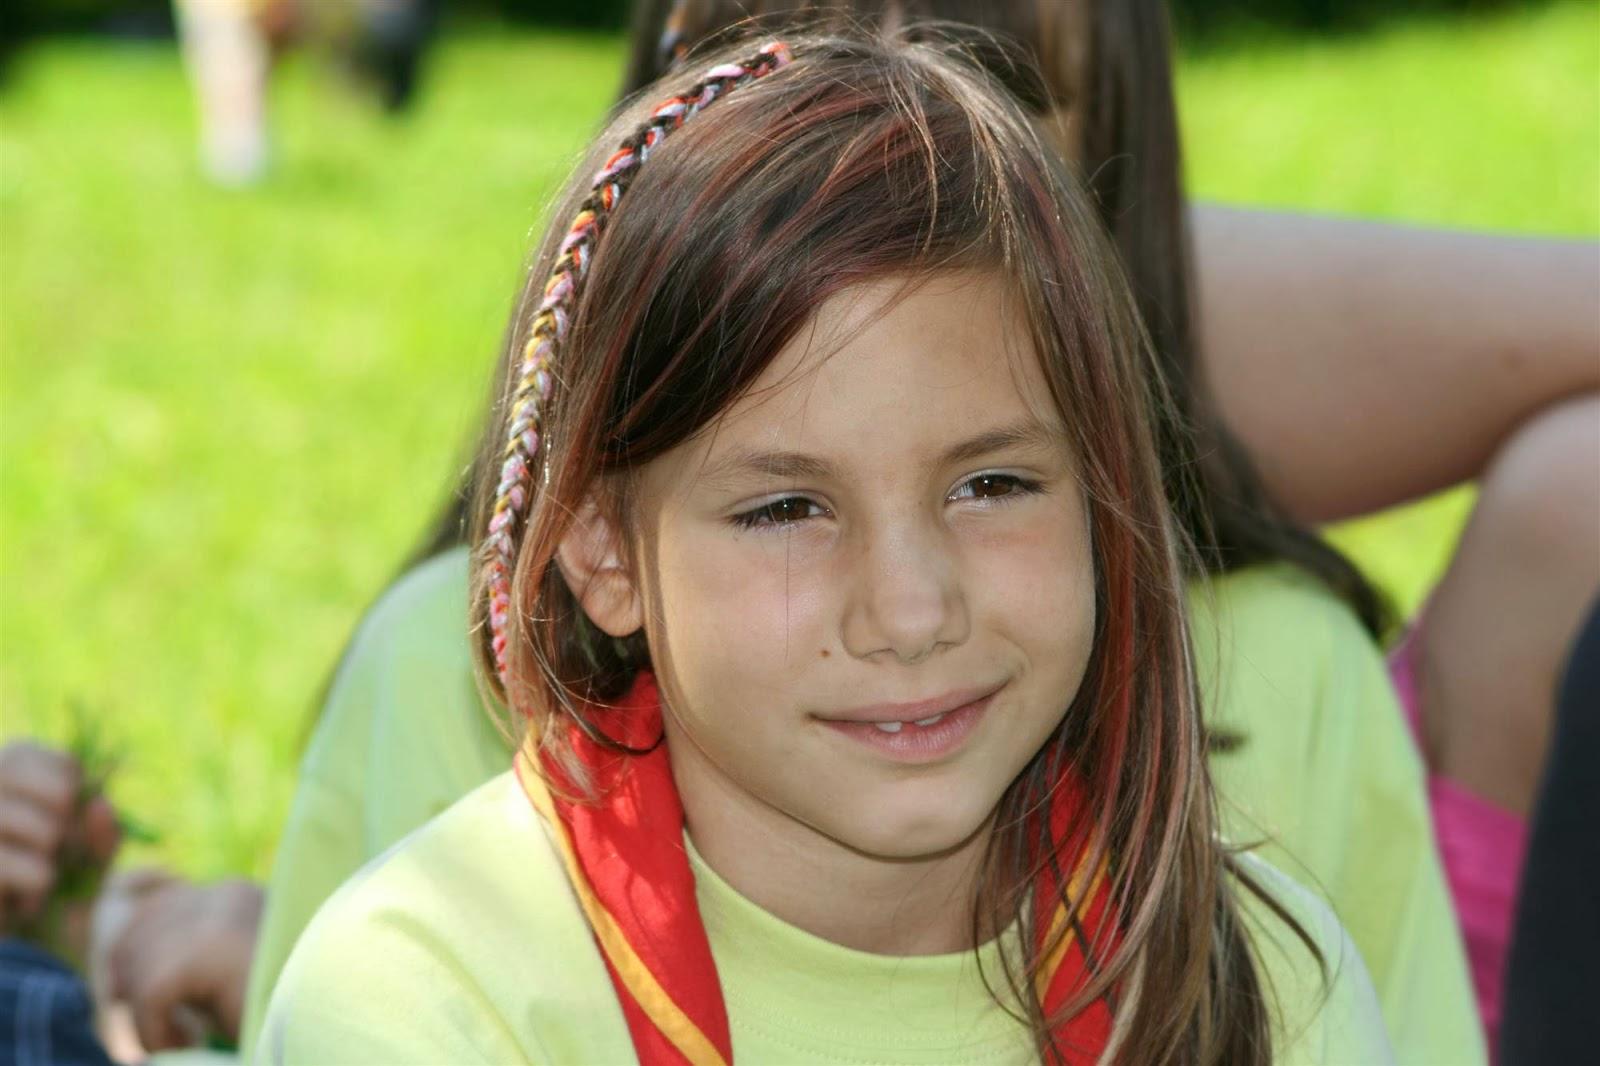 Državni mnogoboj, Velenje 2007 - IMG_8800.jpg